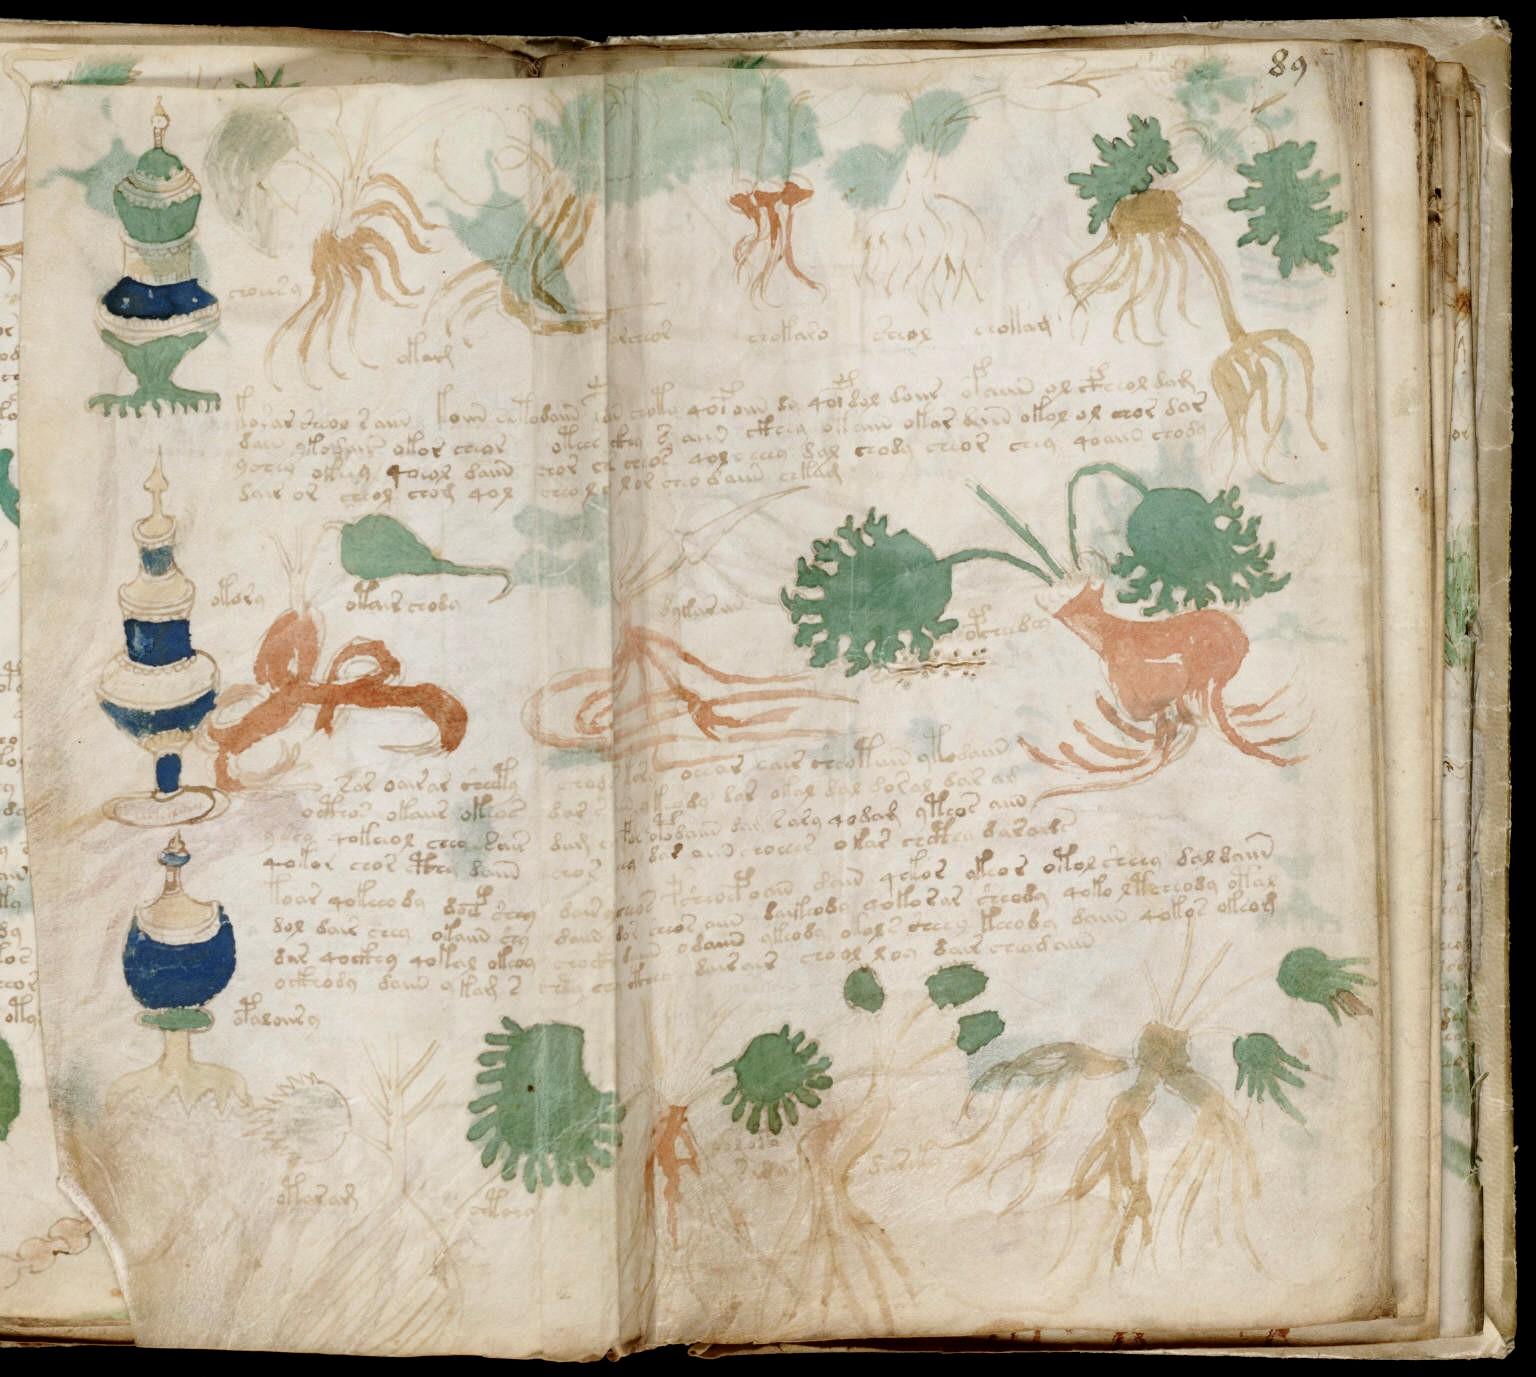 Voynich-Manuscript-1006234.jpg